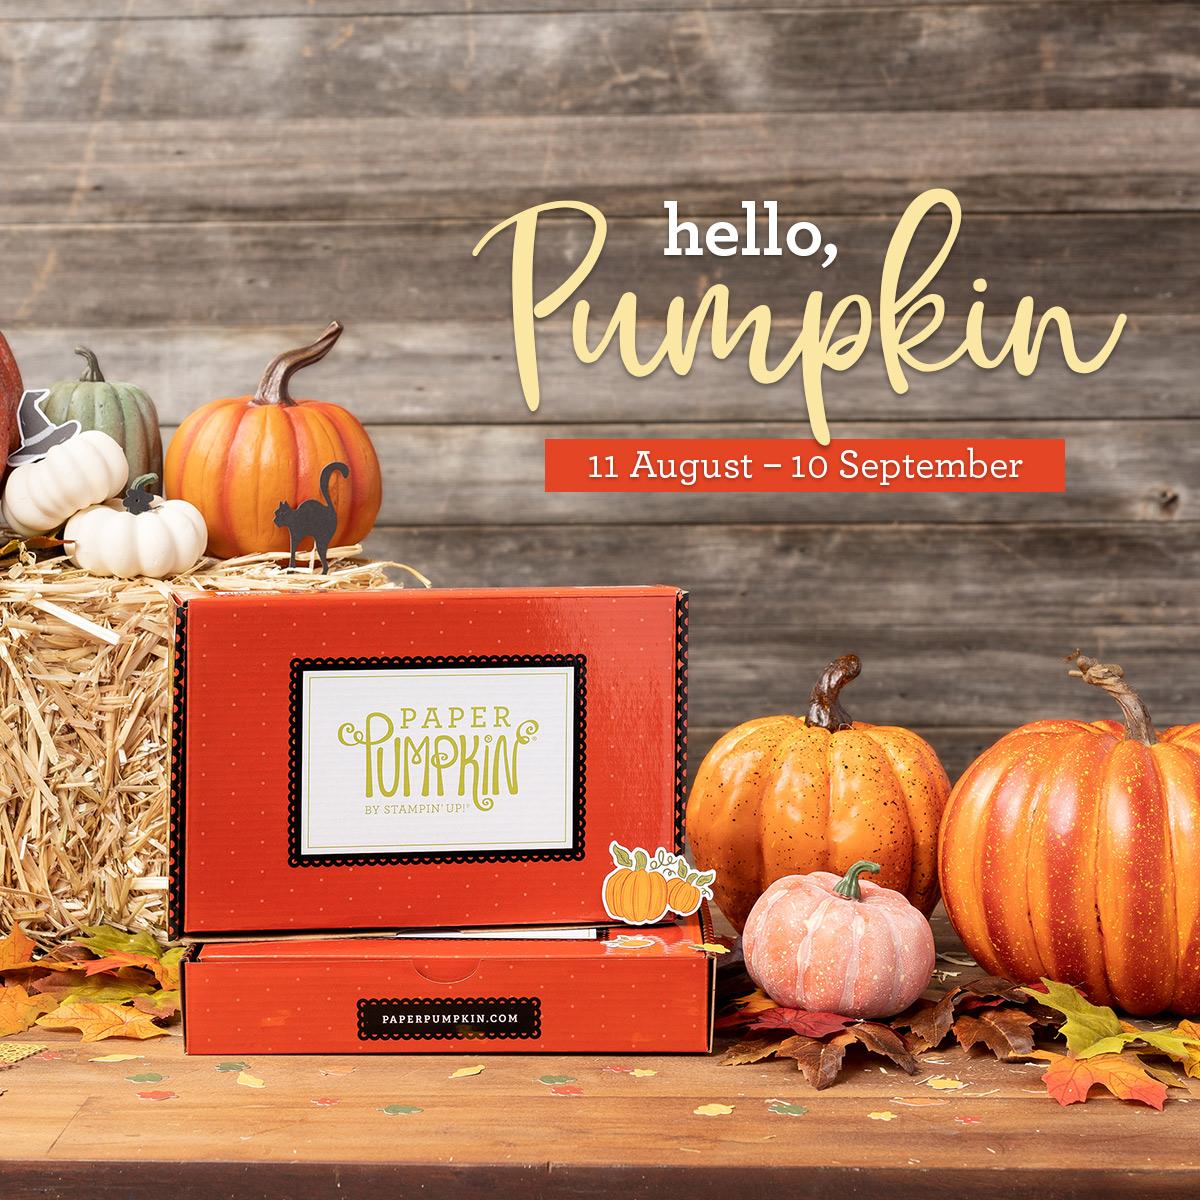 Paper Pumpkin - September Sub Box